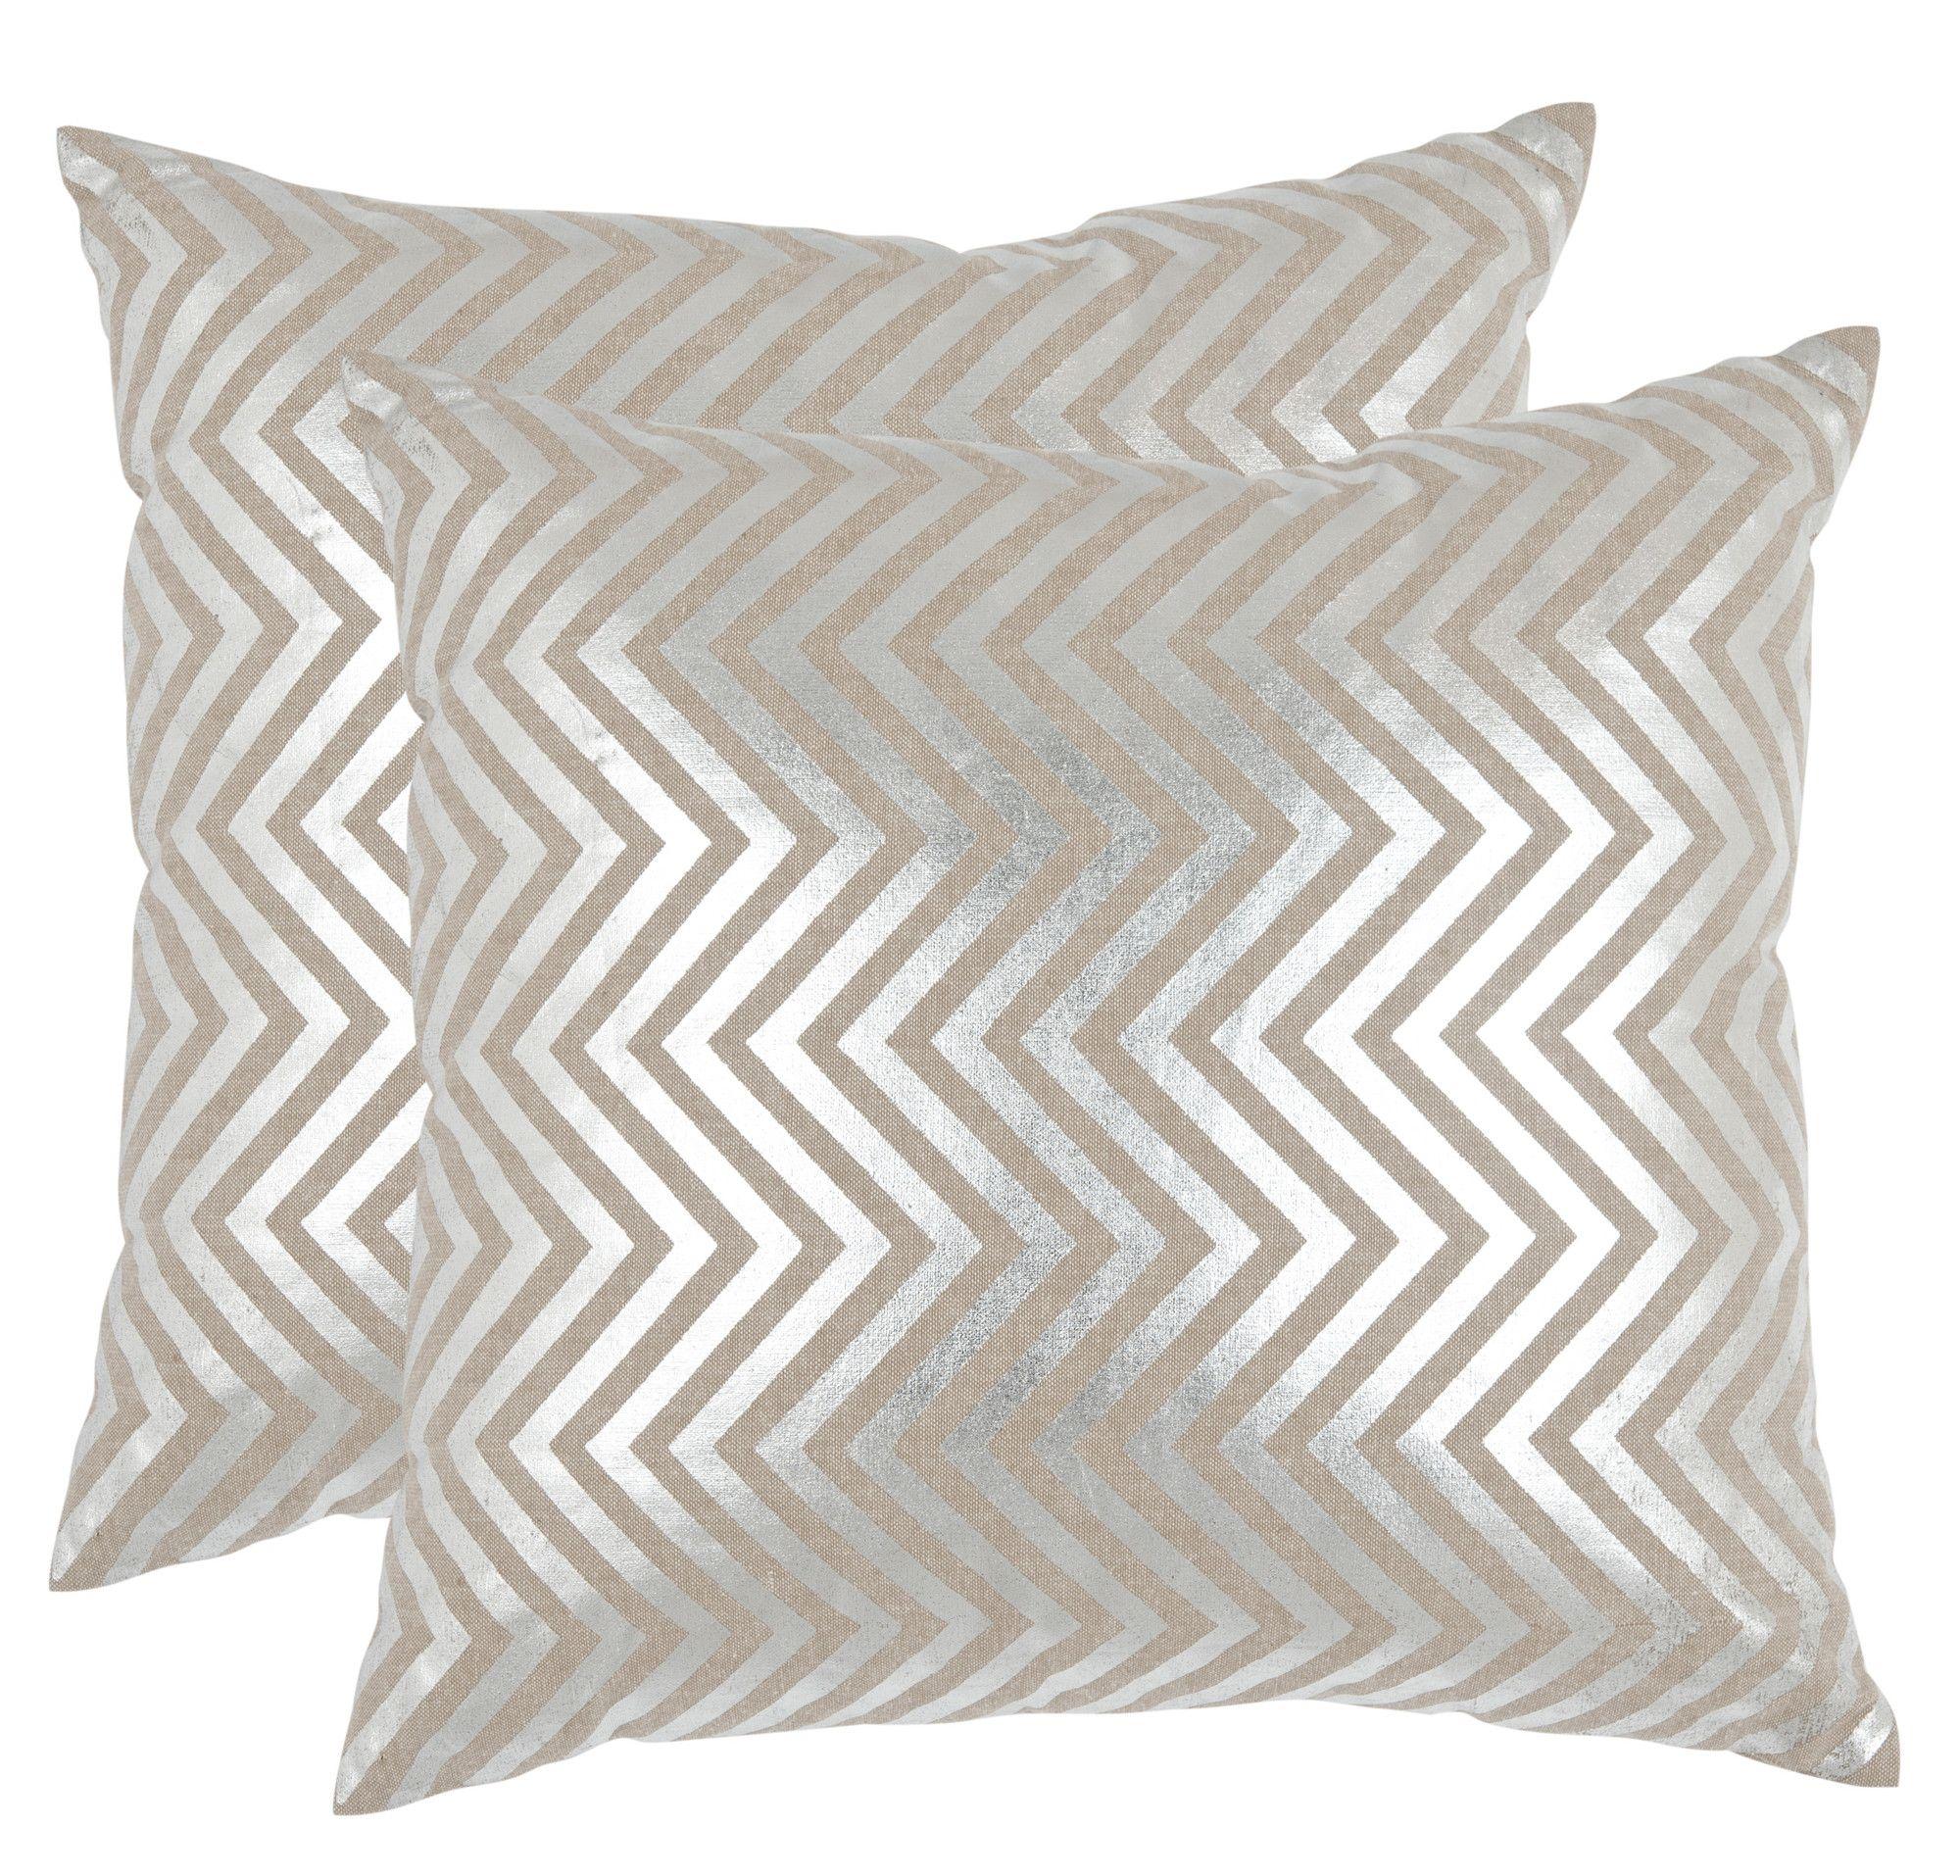 Safavieh Elle Linen Decorative Pillow   Wayfair   Happy Hanukkah ...